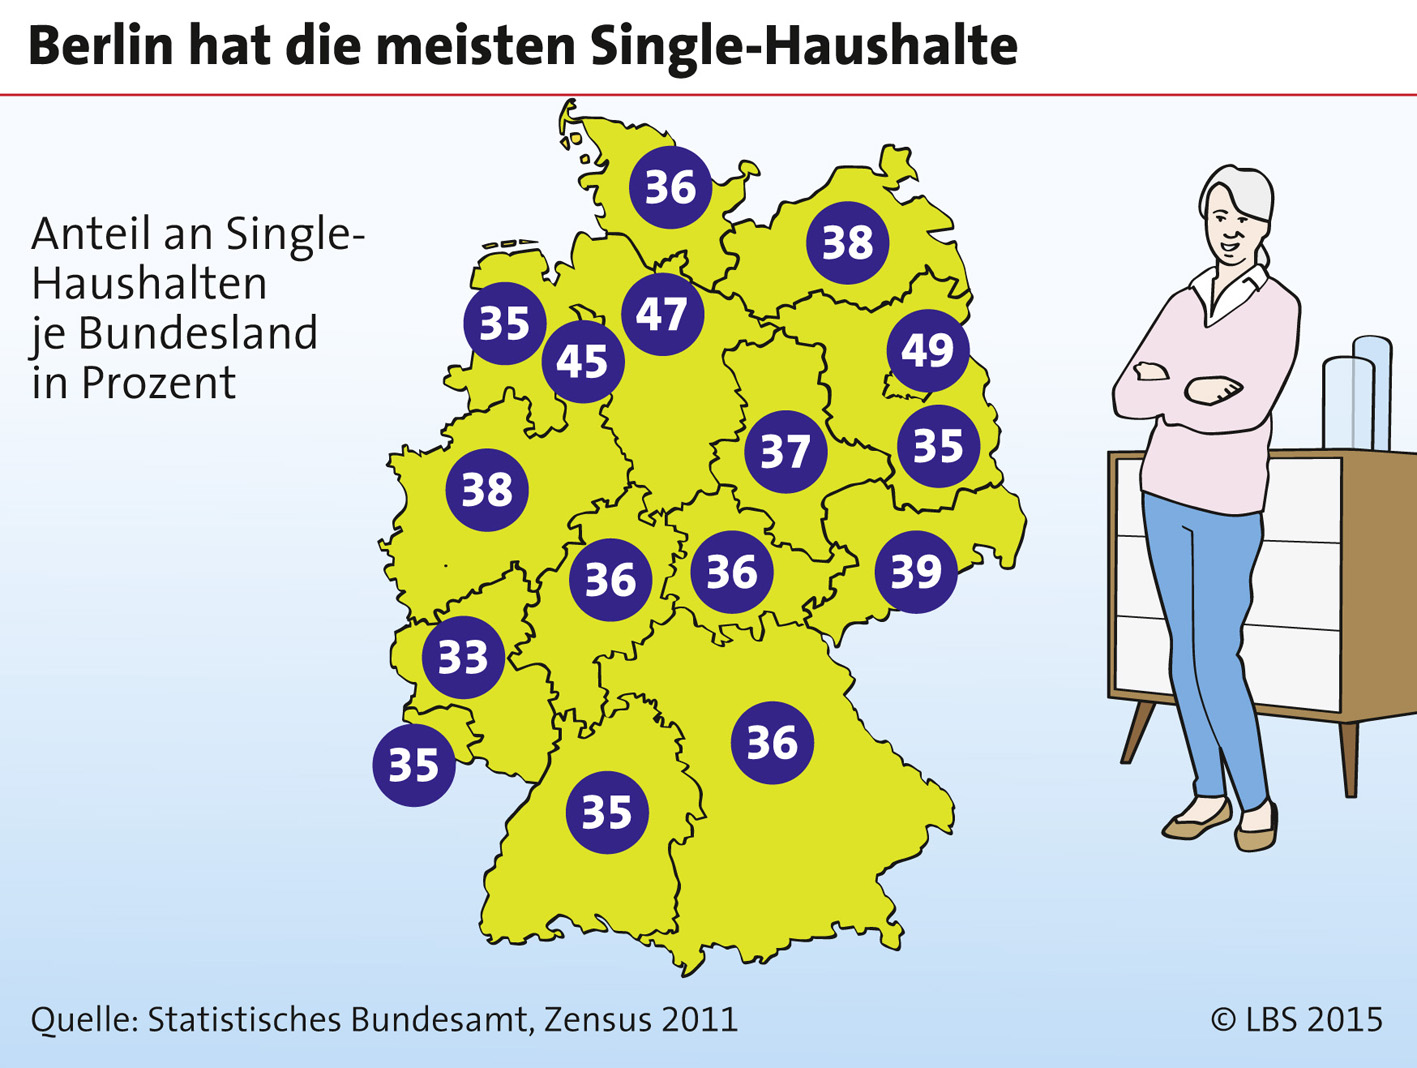 Other Berlin Cities